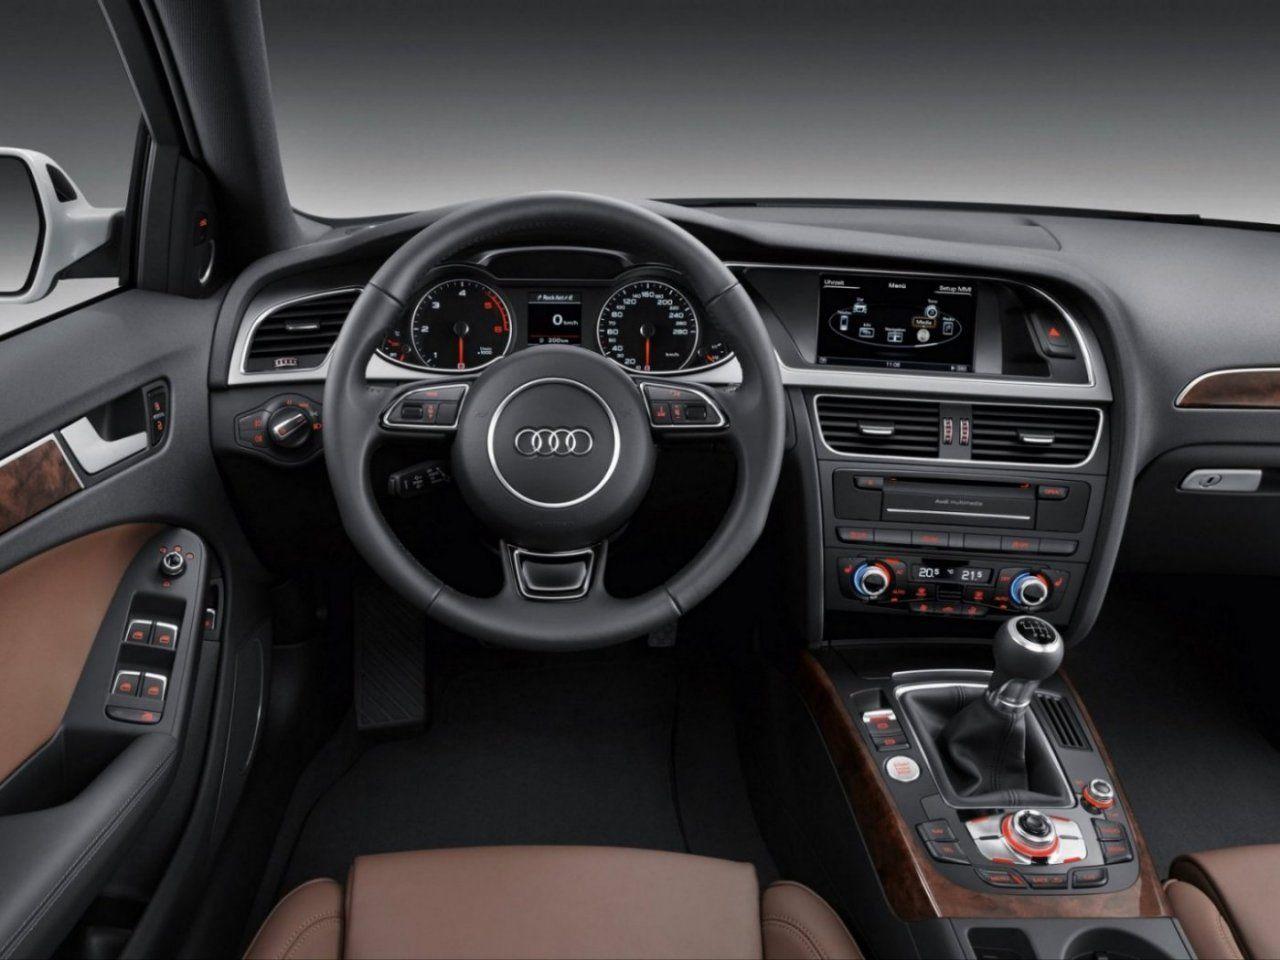 2012 Audi A4 Avant Dashboard Car Interior Steering Wheel Wallpapers Audi A4 Avant Audi A4 Audi